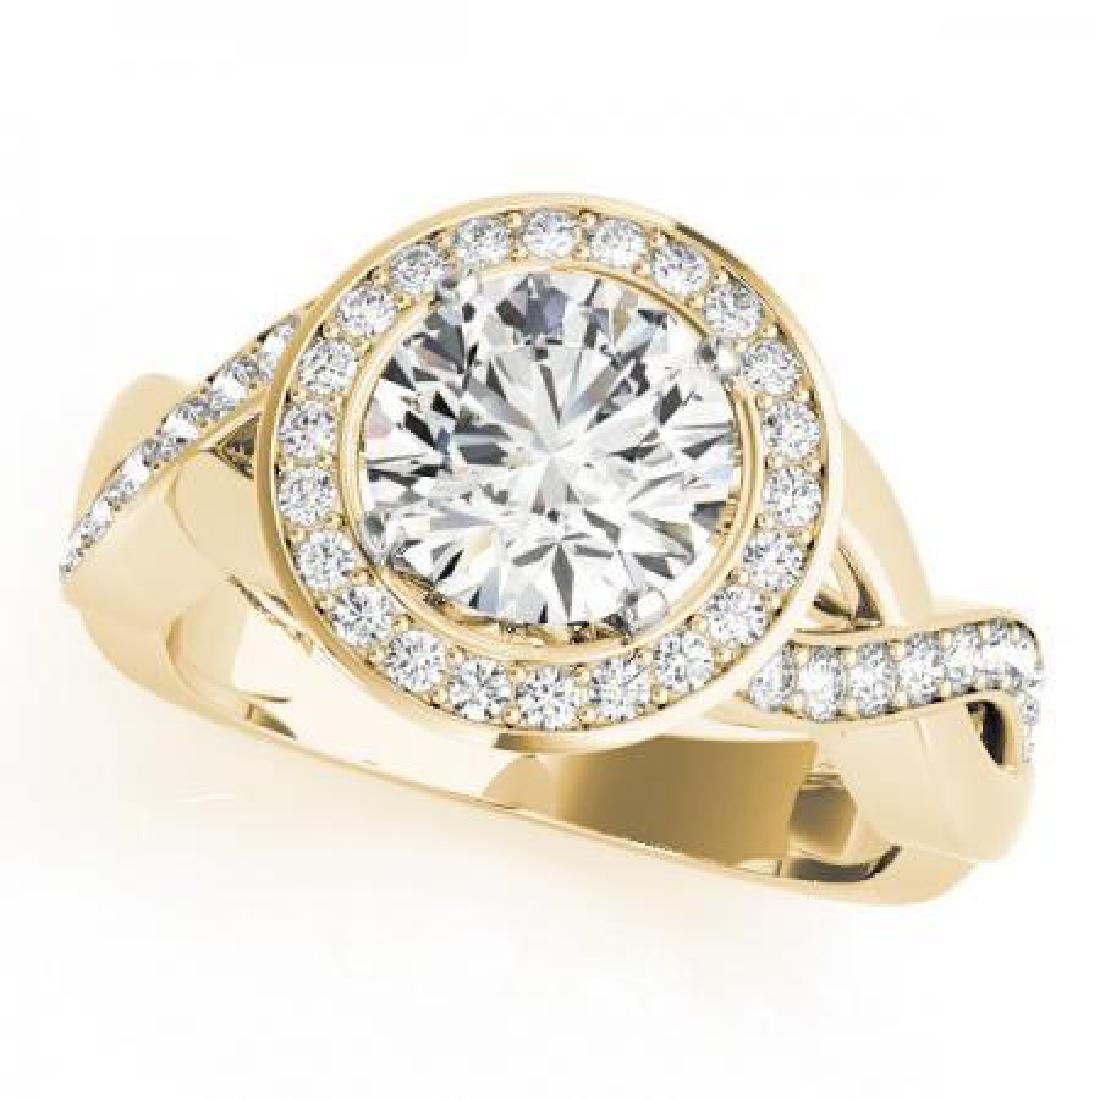 CERTIFIED 18K YELLOW GOLD 1.32 CT G-H/VS-SI1 DIAMOND HA